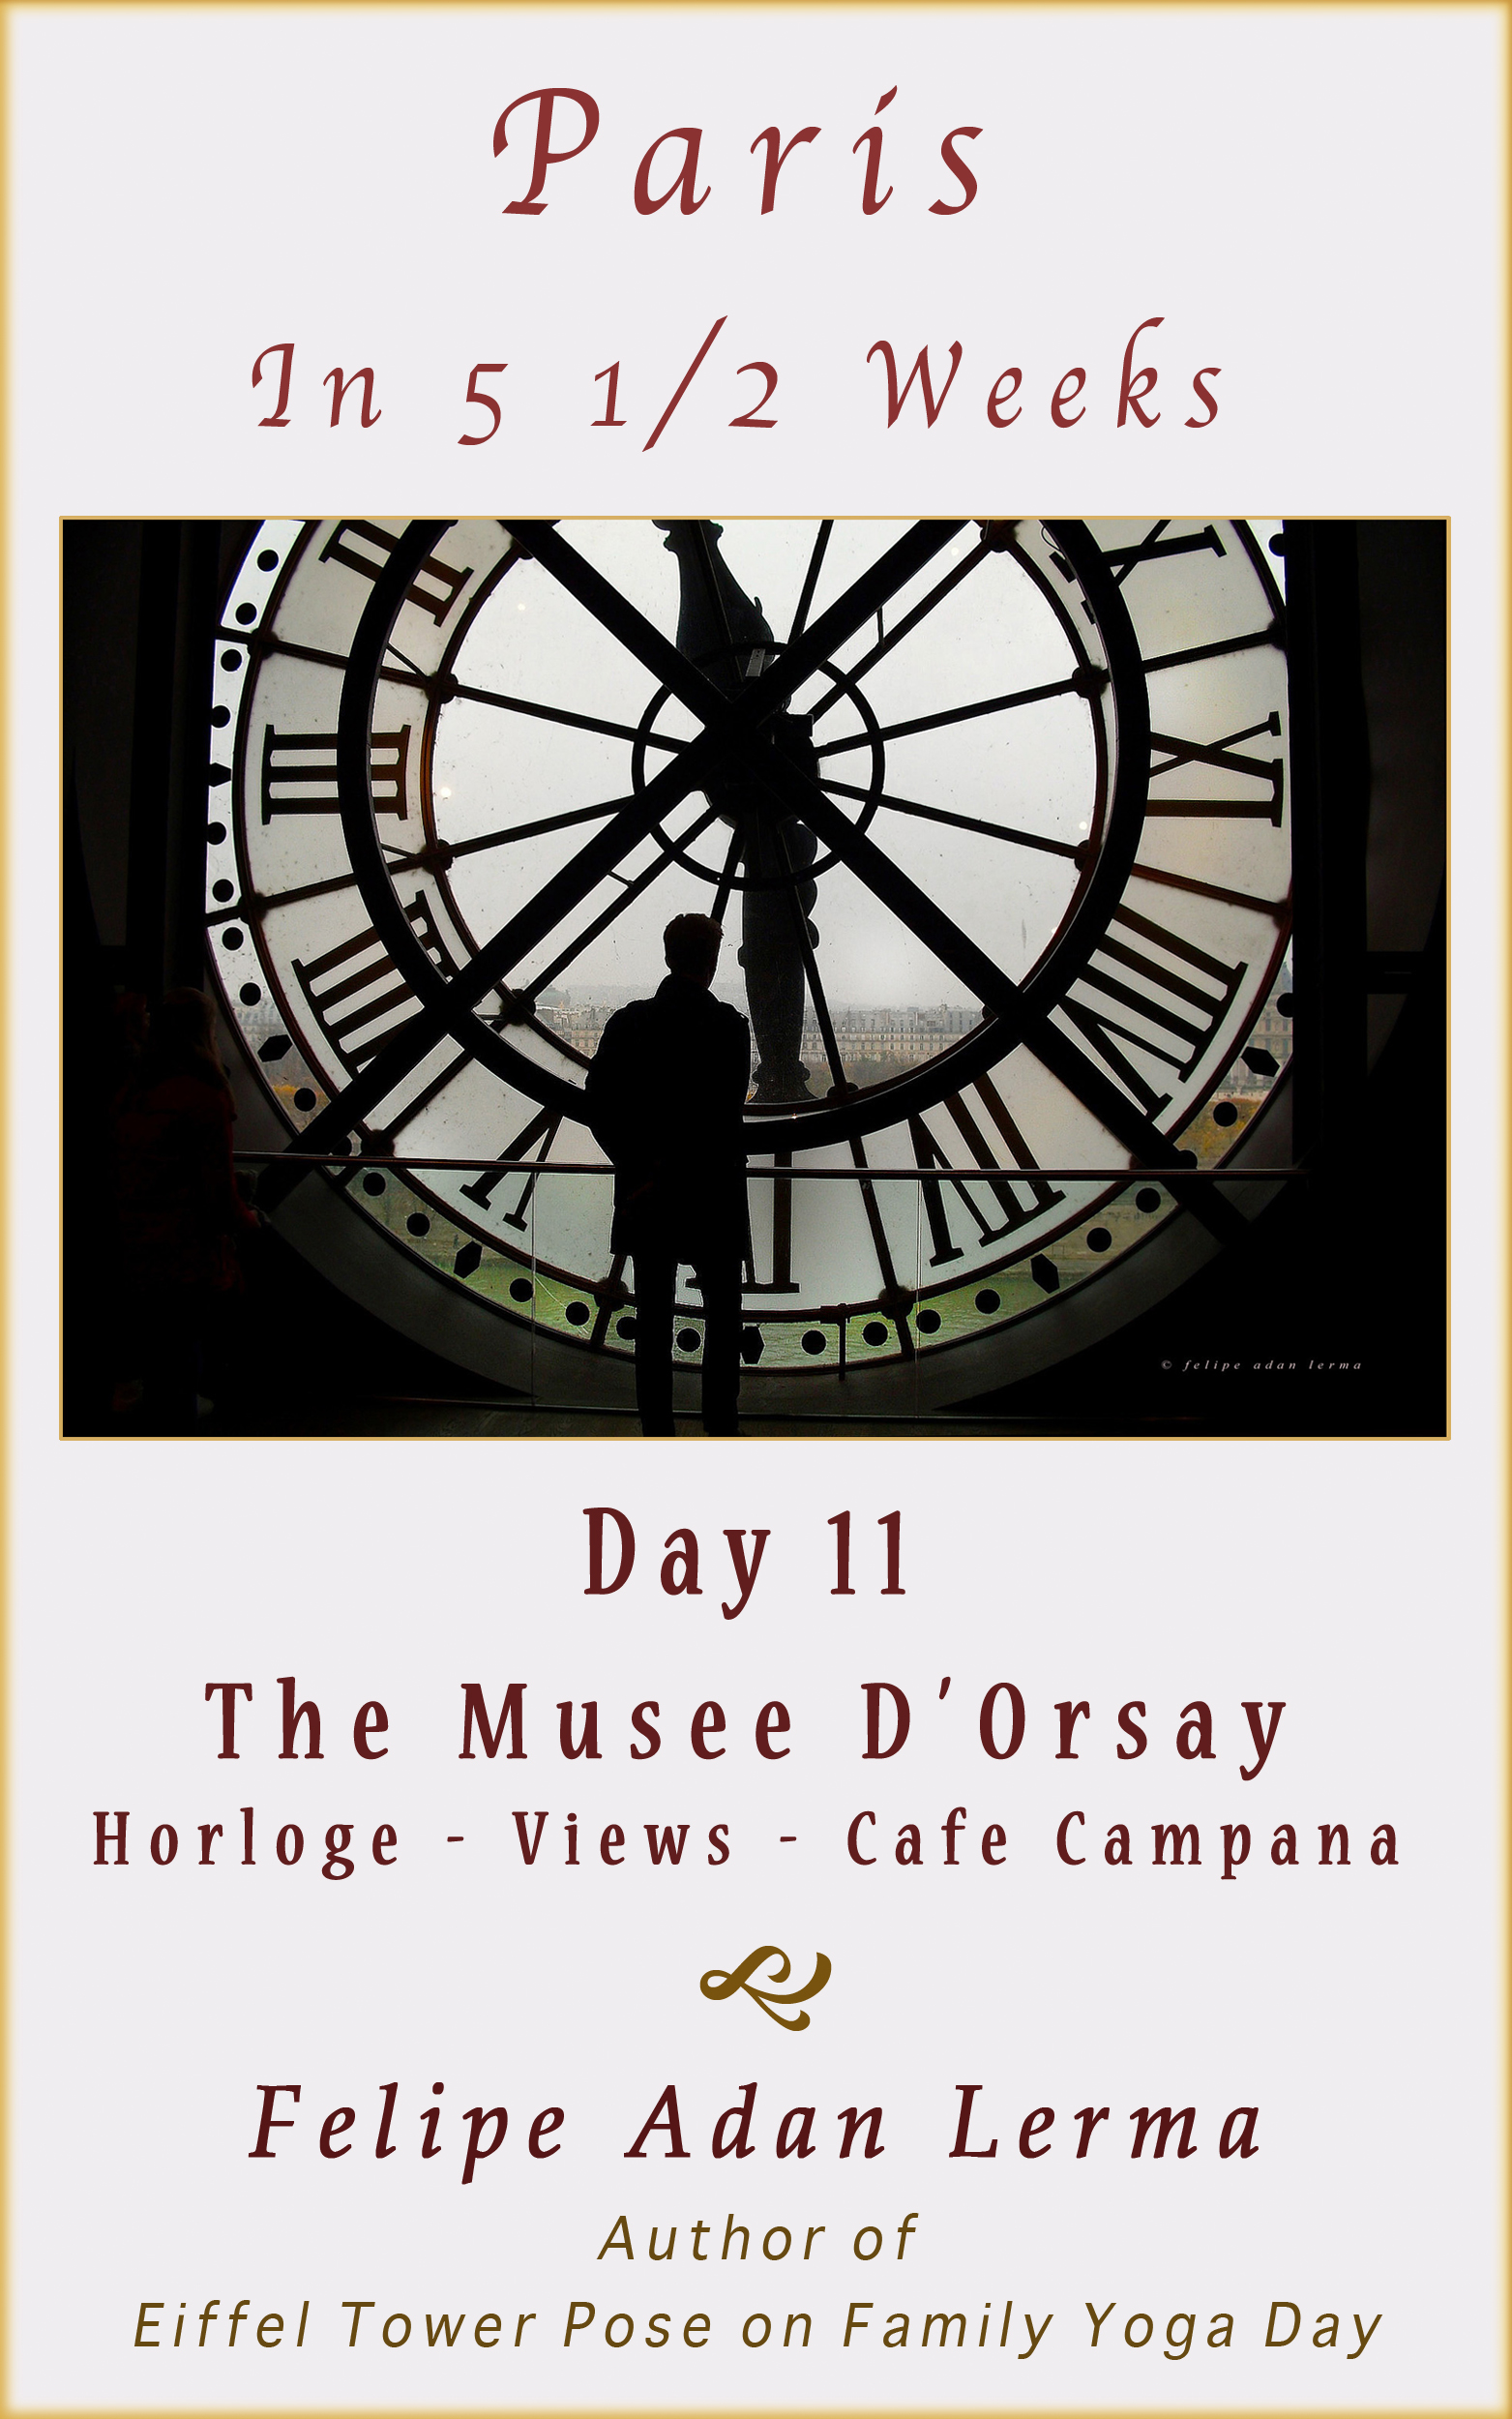 Paris in 5 1/2 Weeks, Day 11 The Musee d'Orsay © Felipe Adan Lerma - On Amazon https://amzn.to/2HhyL0a .